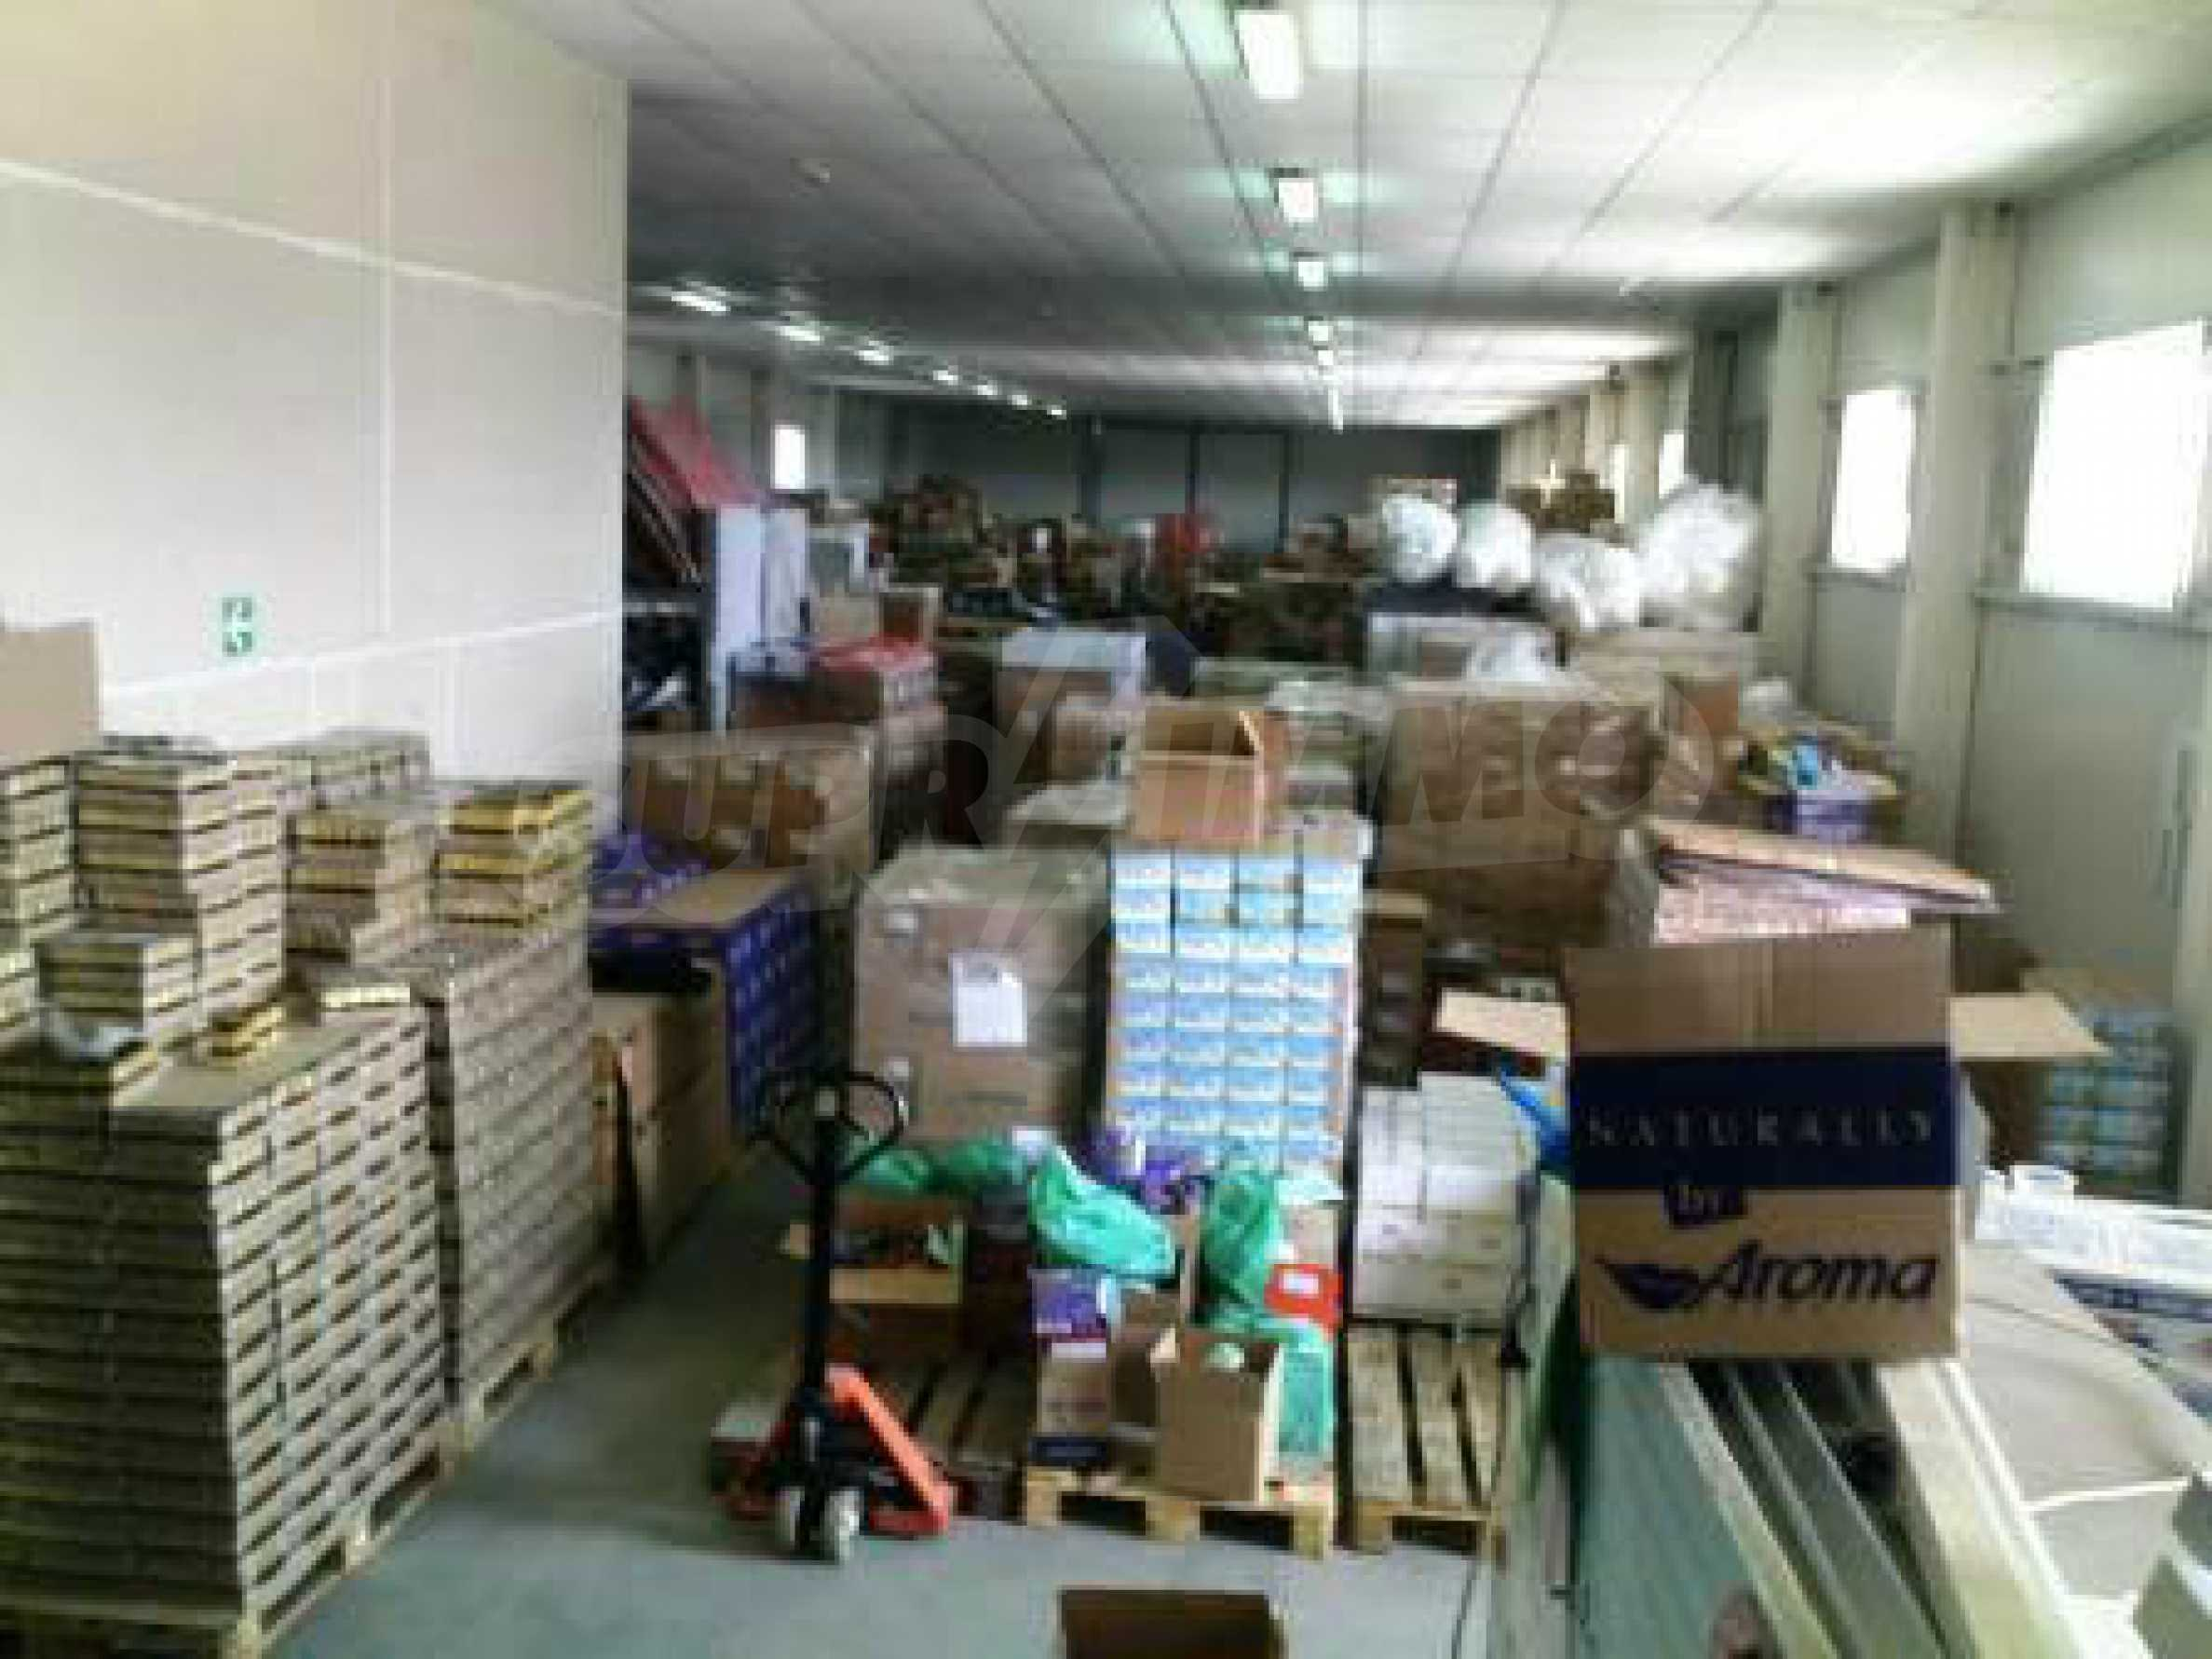 Warehouse on the main E85 road, Rousse-Svilengrad  27